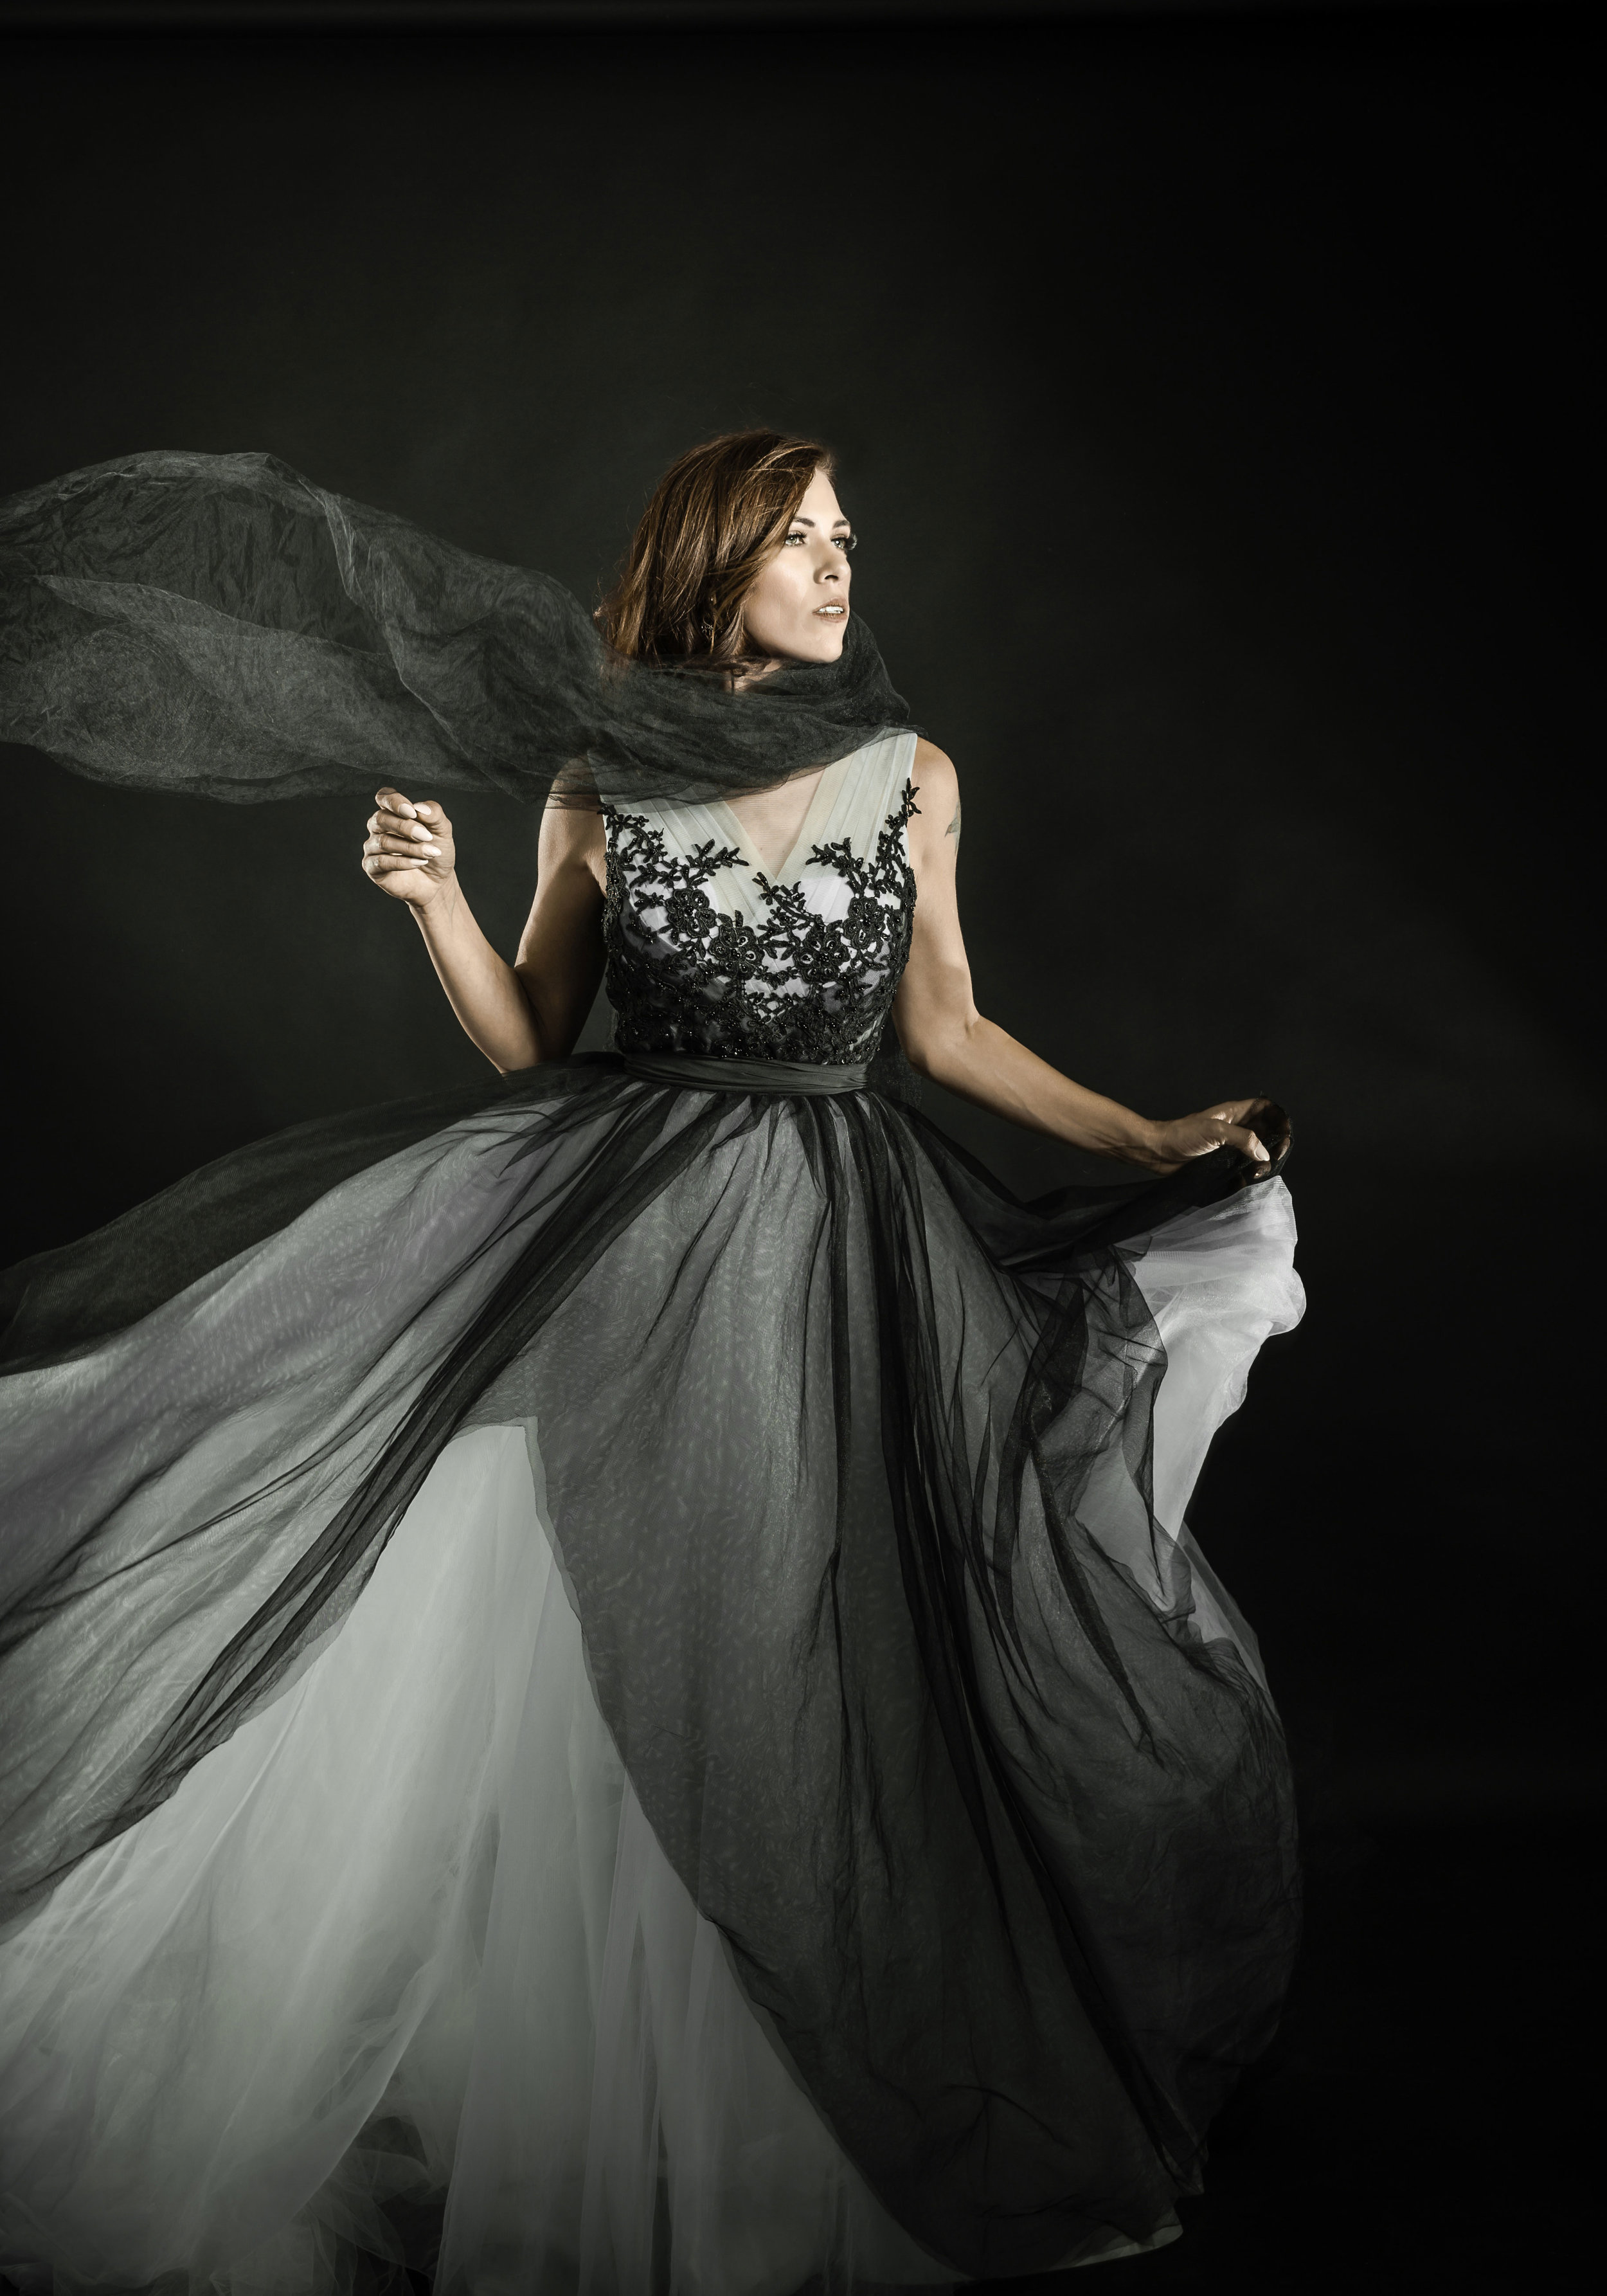 best-portrait-photographer-colorado-springs-0056.jpg